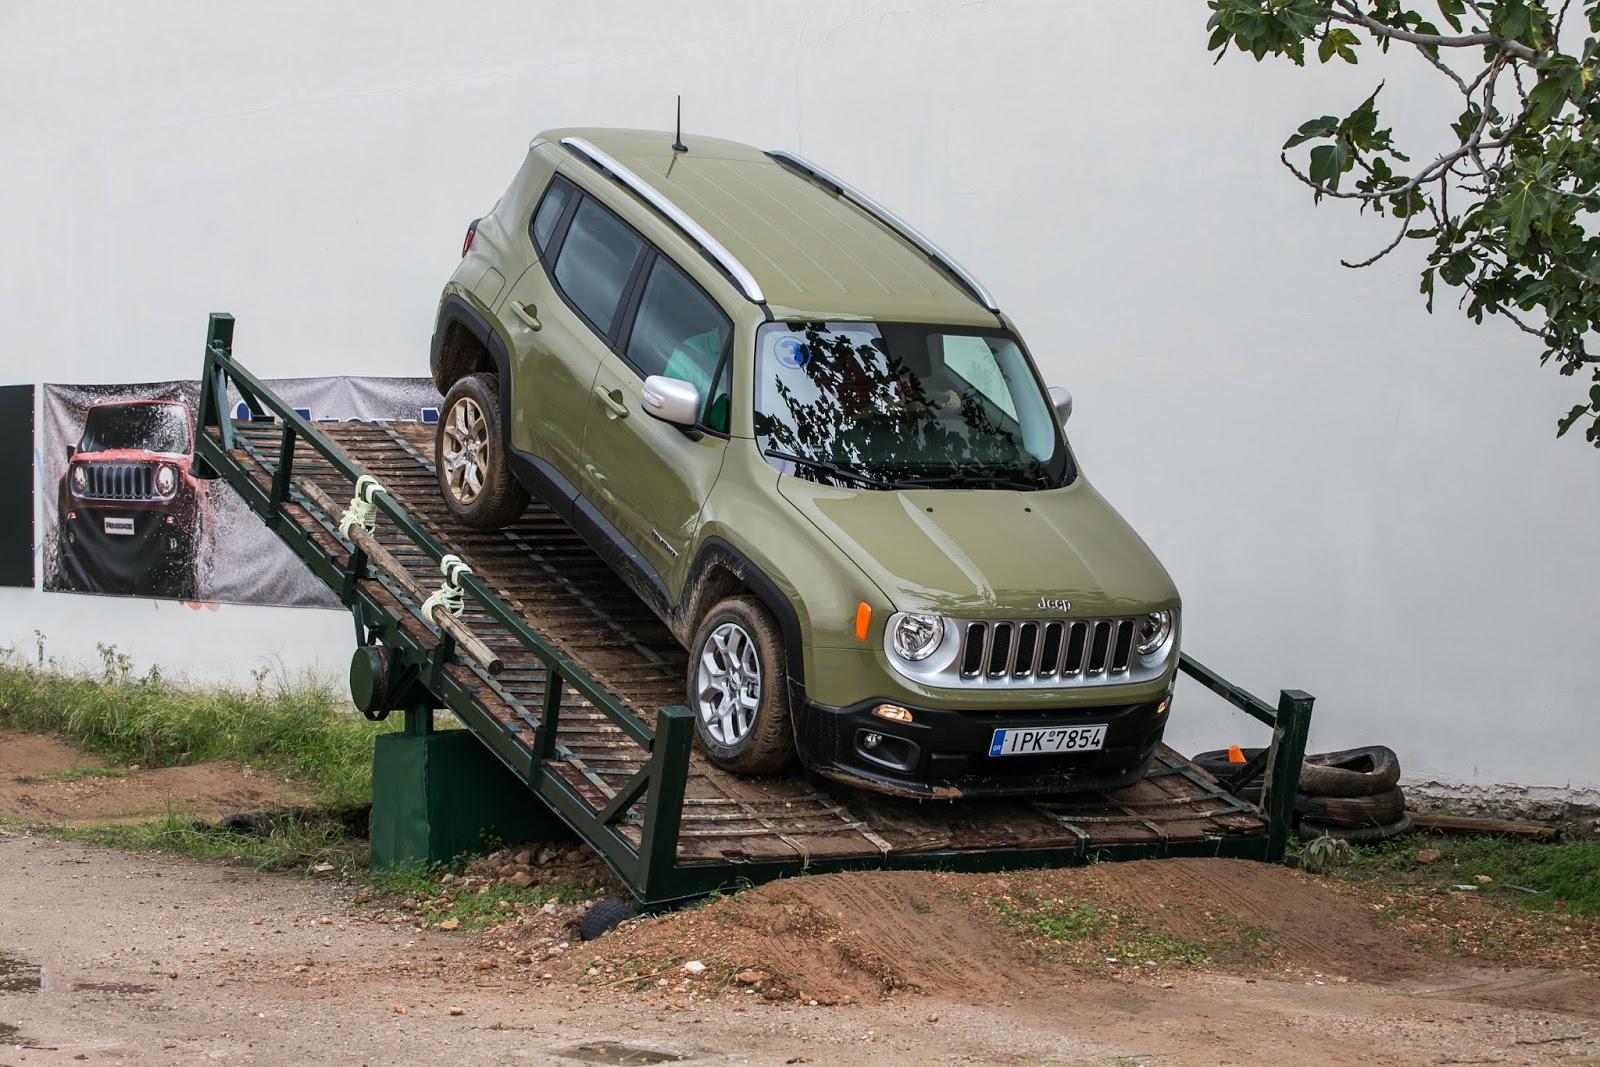 JEEP%2BCAMP KF 1555 Πετάμε ένα Jeep Renegade σε λάσπες, πέτρες, άμμο, λίμνες. Θα τα καταφέρει;